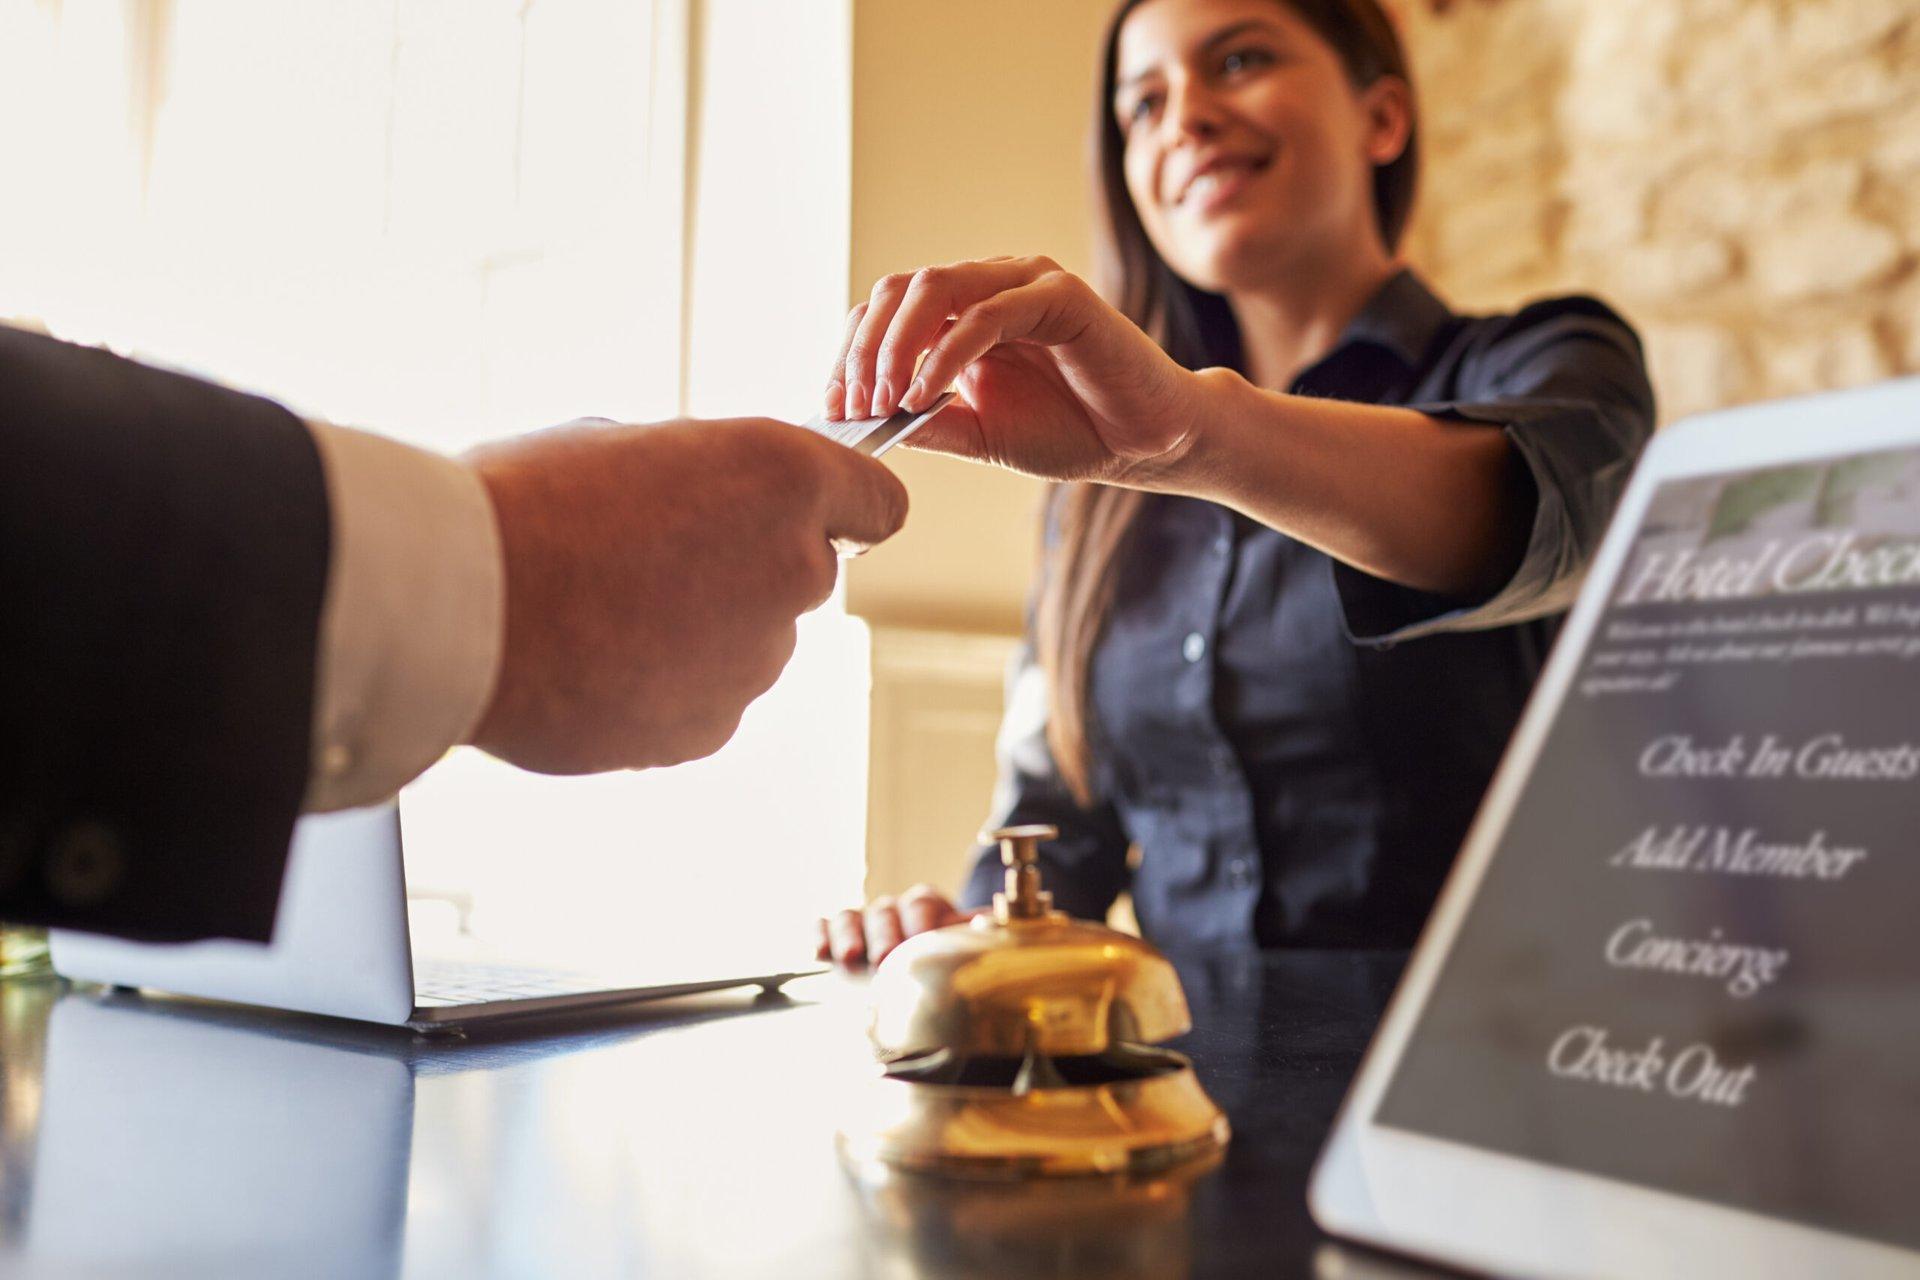 11 Tips for Avoiding Ridiculous Hotel Fees